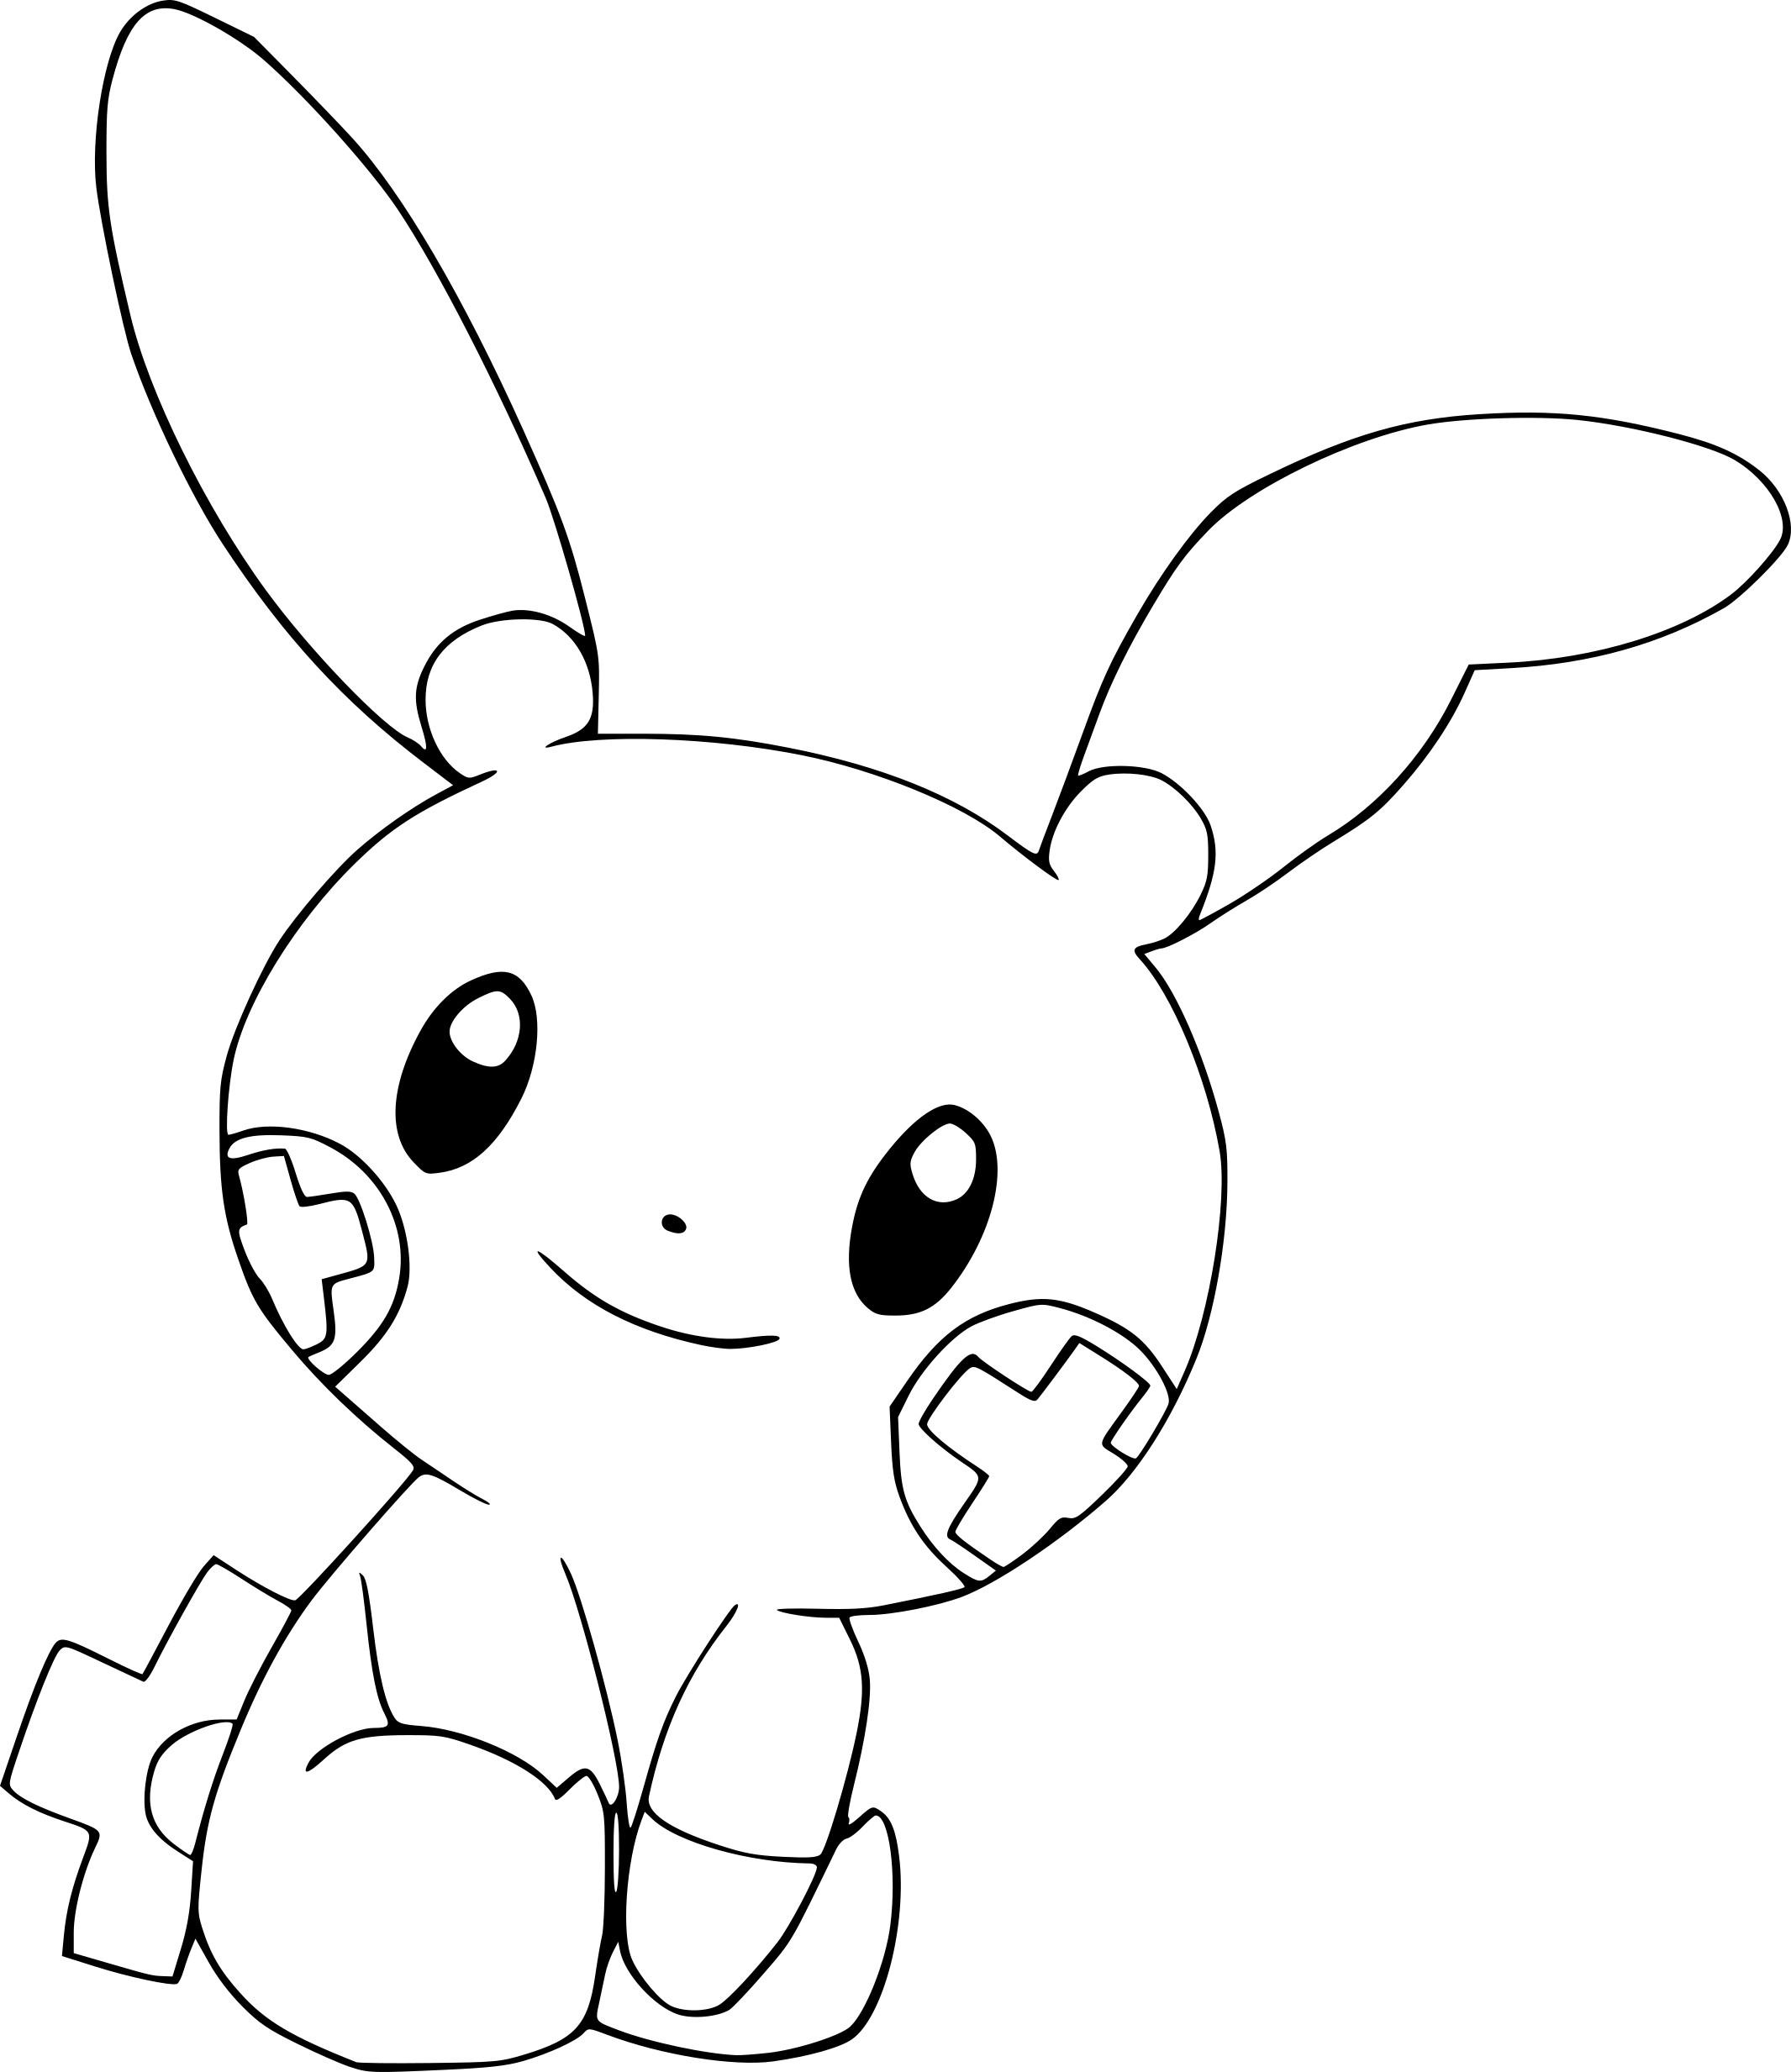 Coloriage posipi pokemon imprimer - Dessin de martine a imprimer ...